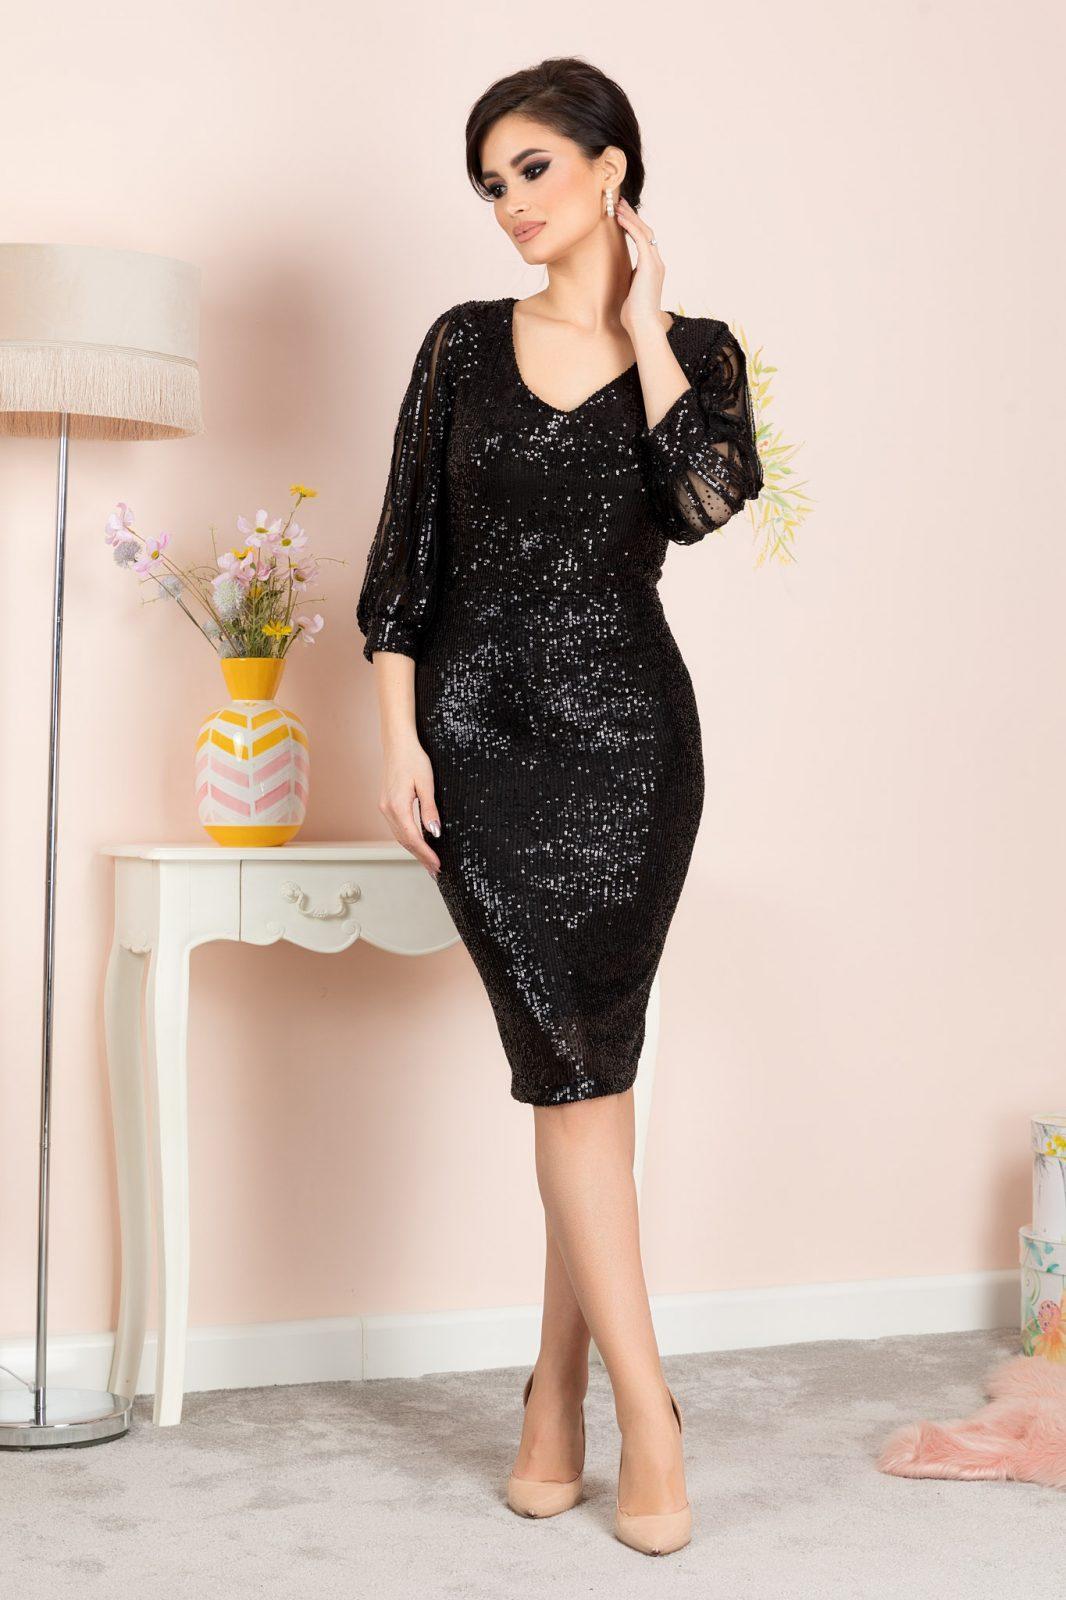 Katriss Black Dress